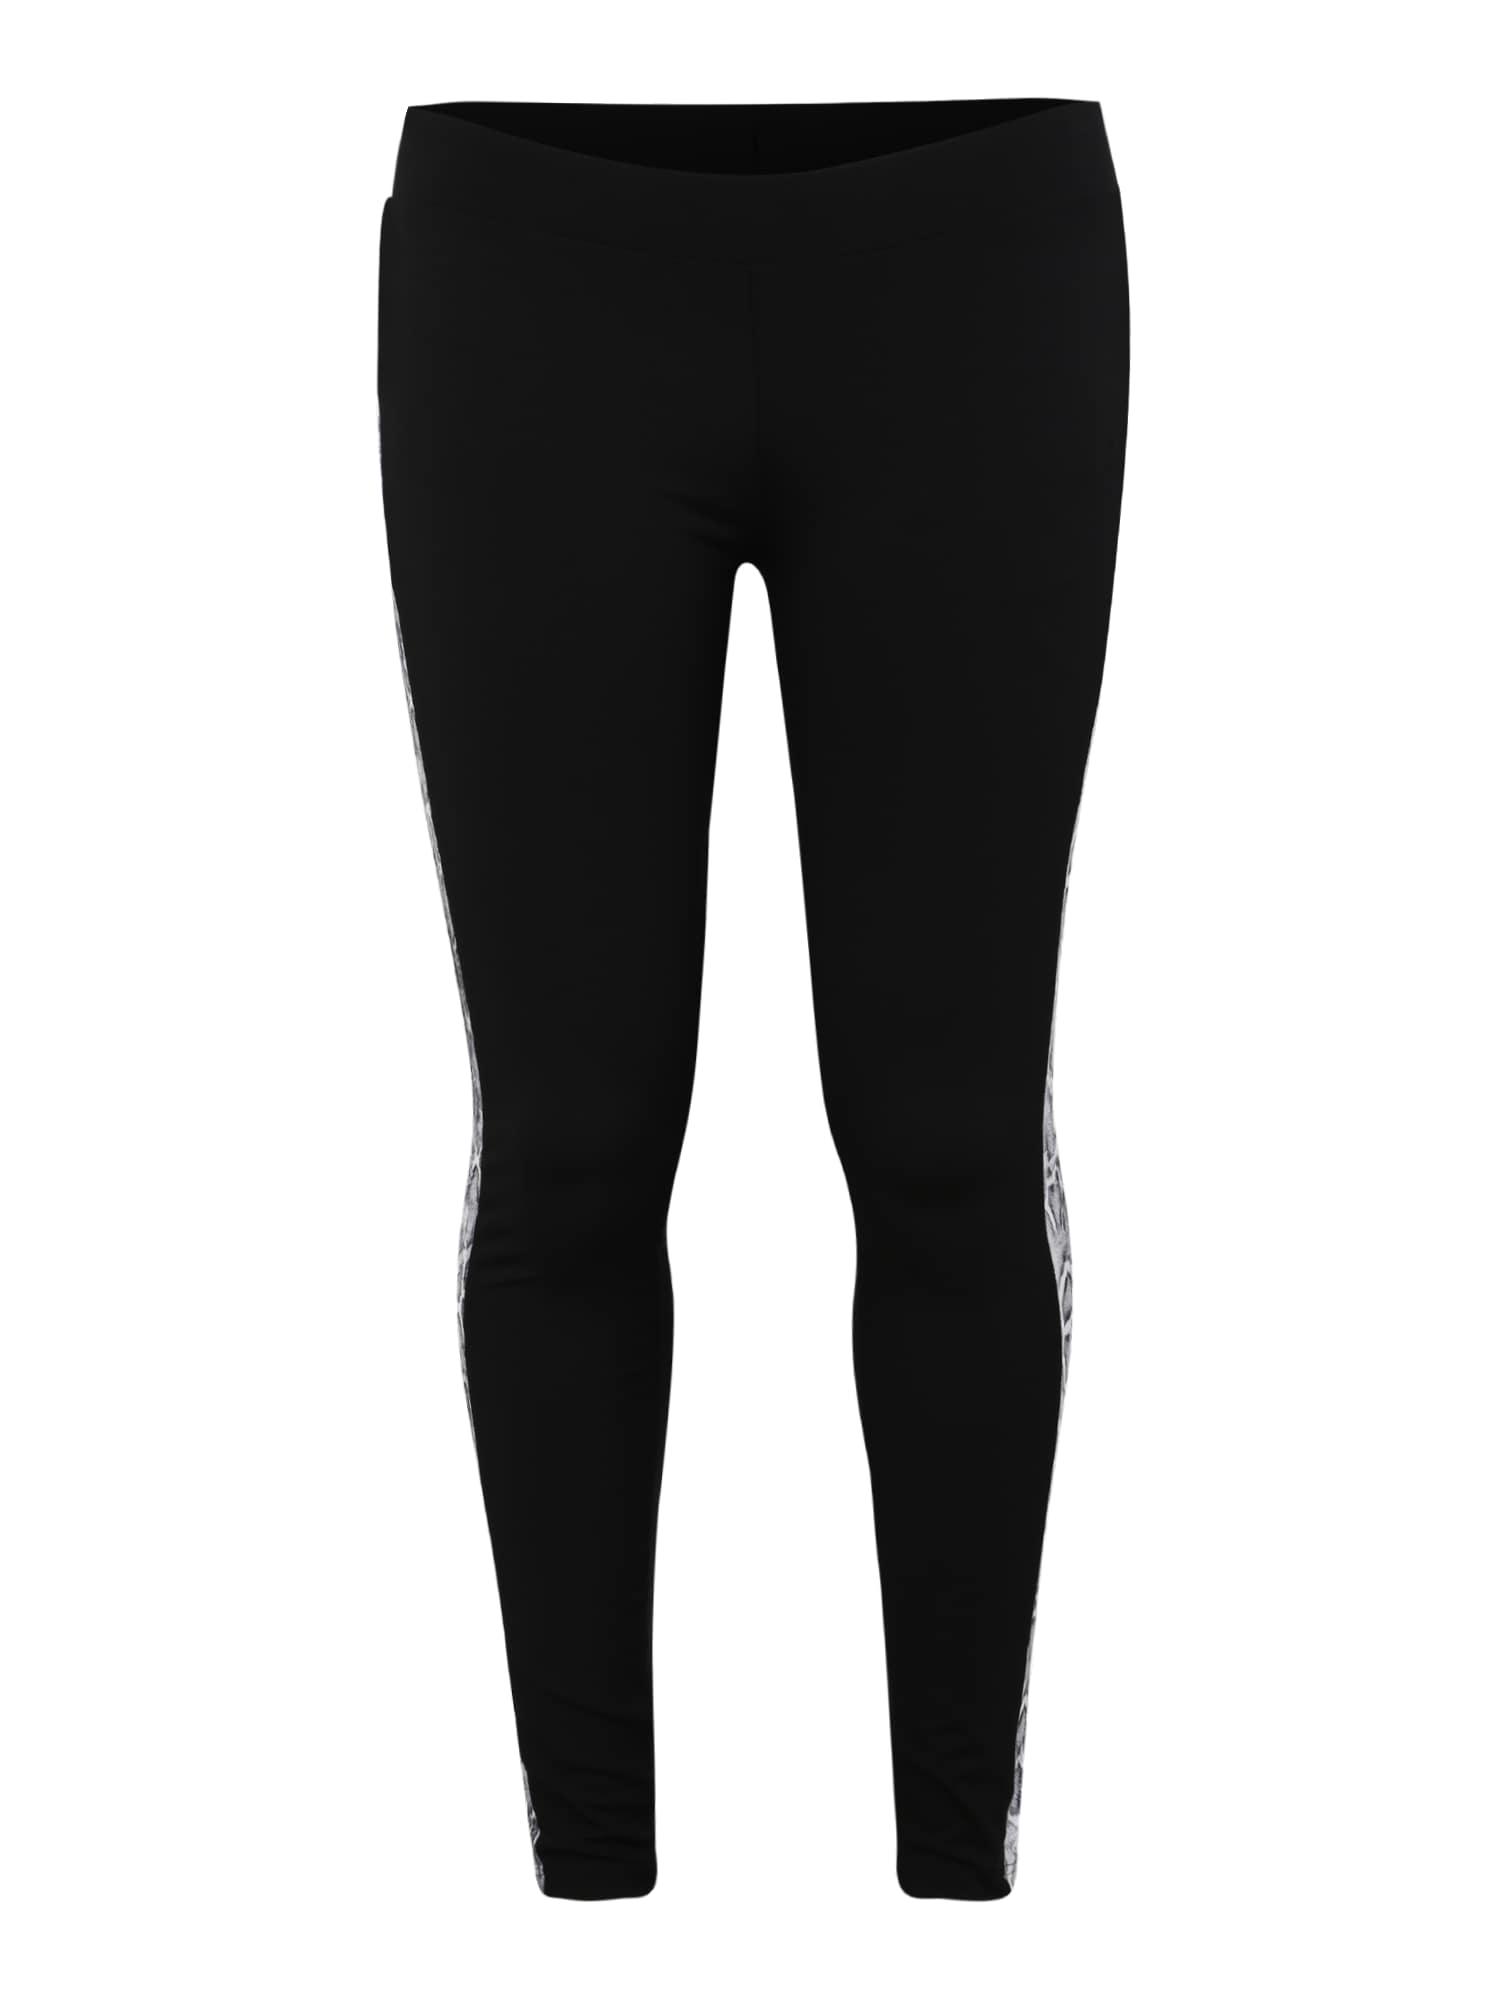 Legíny Ladies Side Striped Pattern Leggings šedá černá bílá Urban Classics Curvy